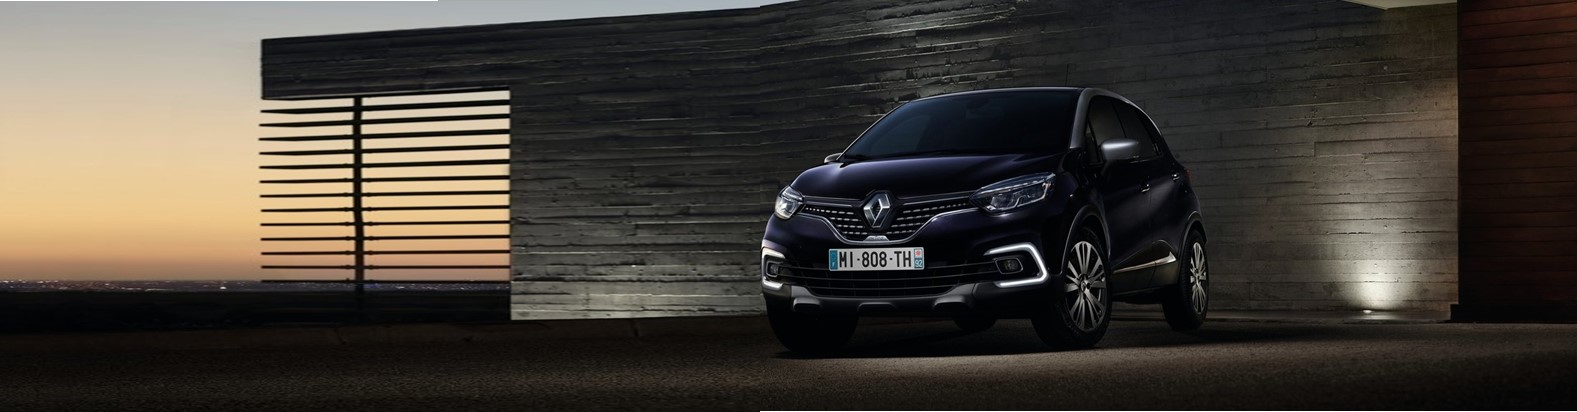 Renault – 2018 Captur 2